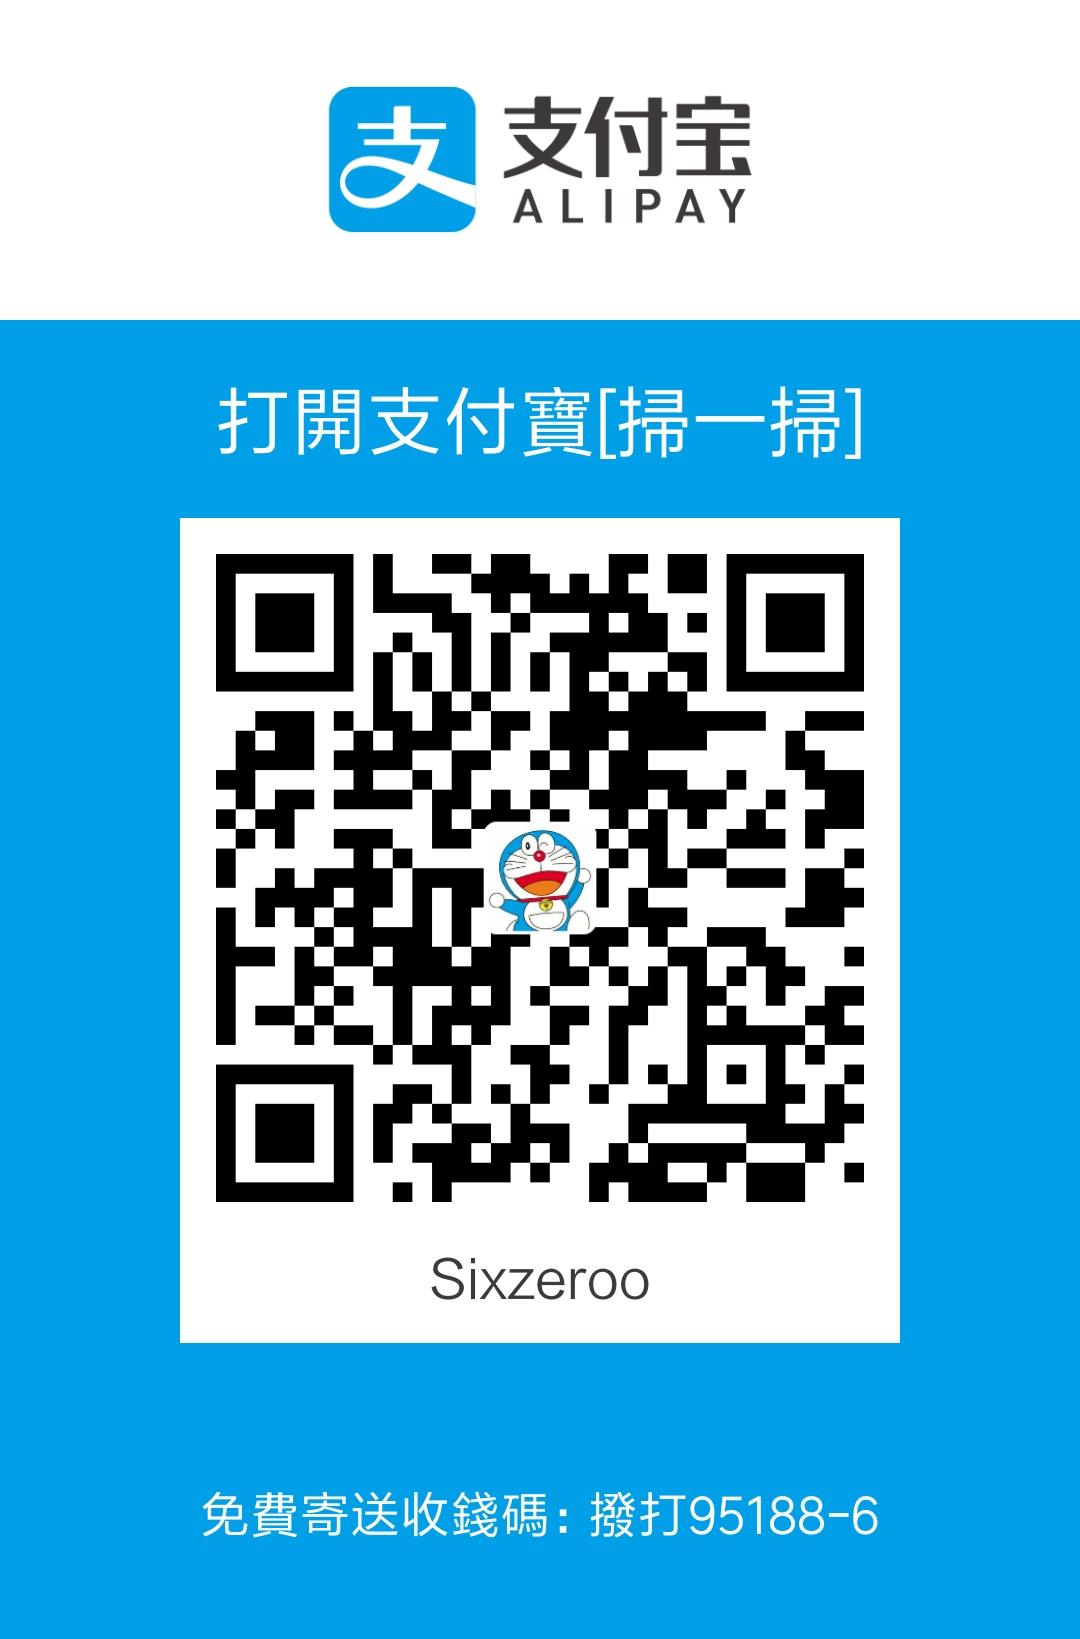 Sixzeroo Alipay